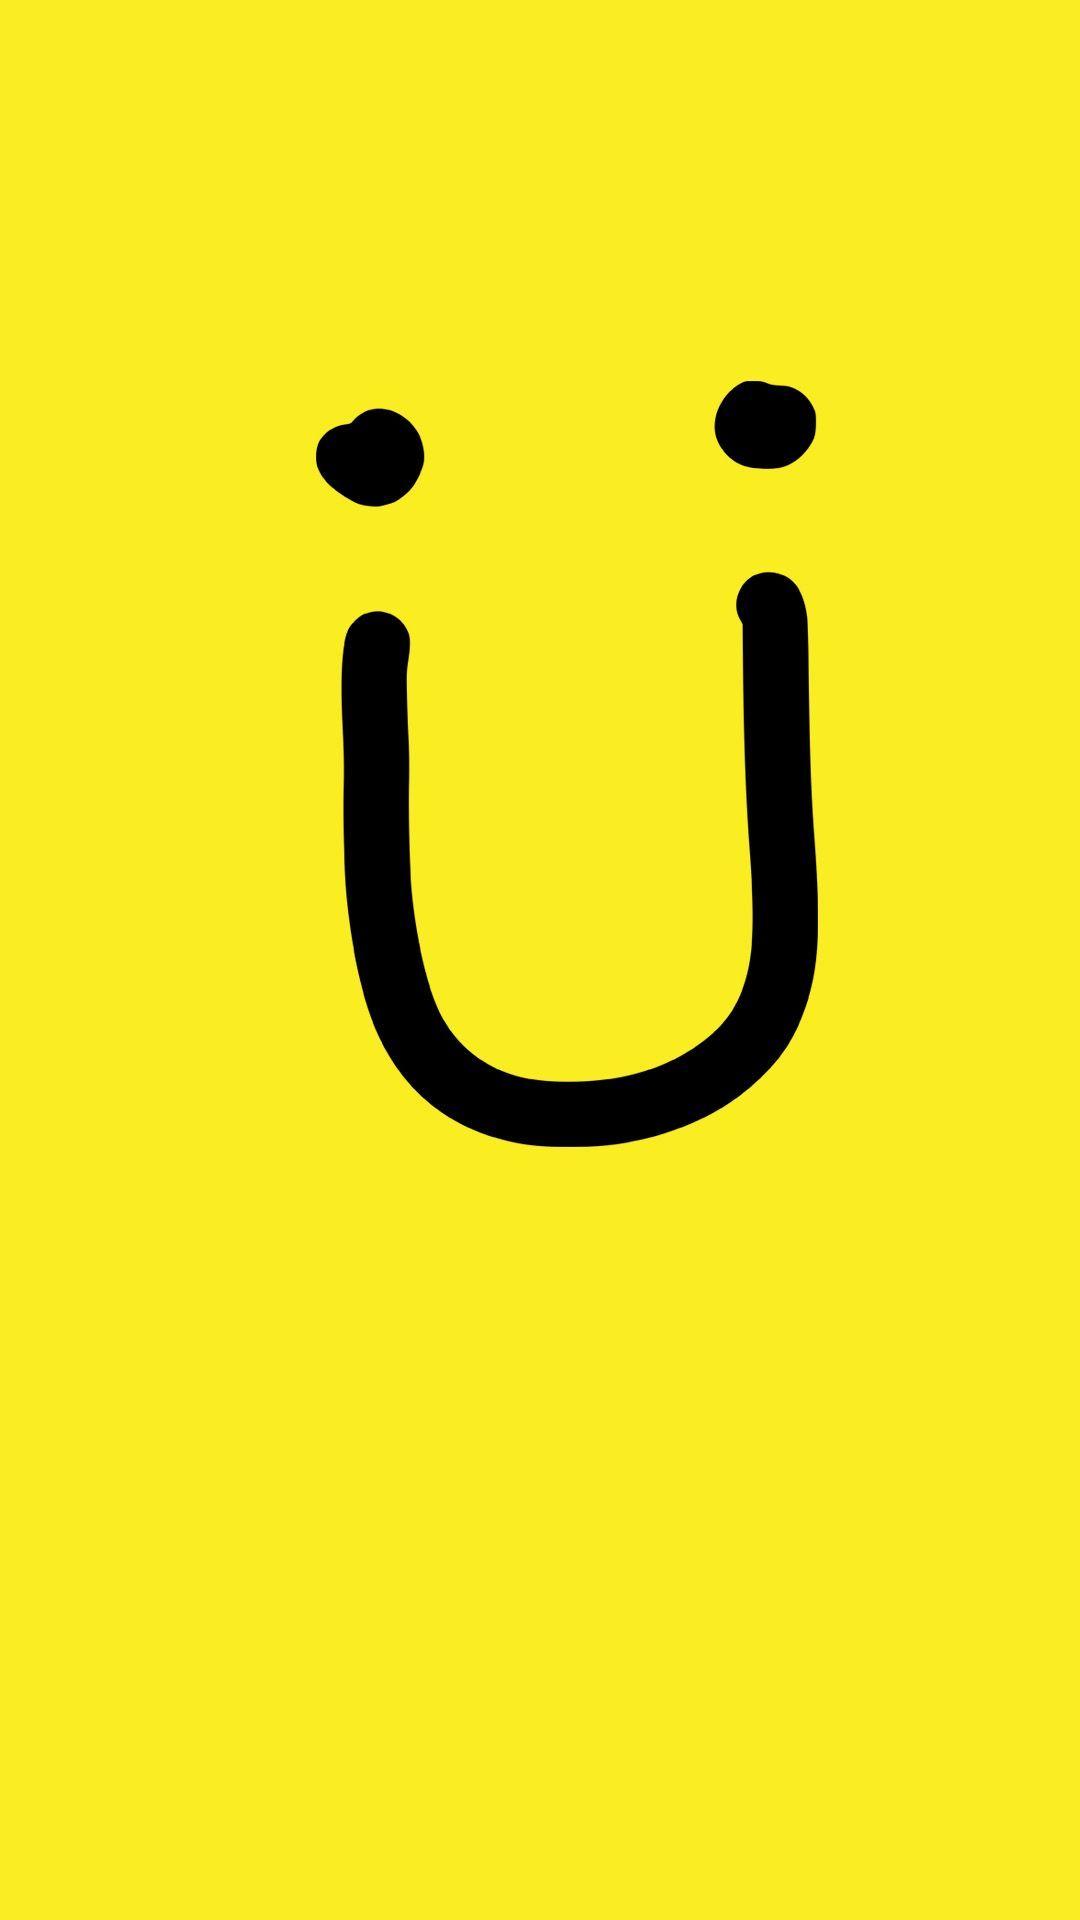 Wallpaper iphone kuning - Jack Wallpaper Iphone Wallpapers Pinterest Wallpaper Skrillex And Edm